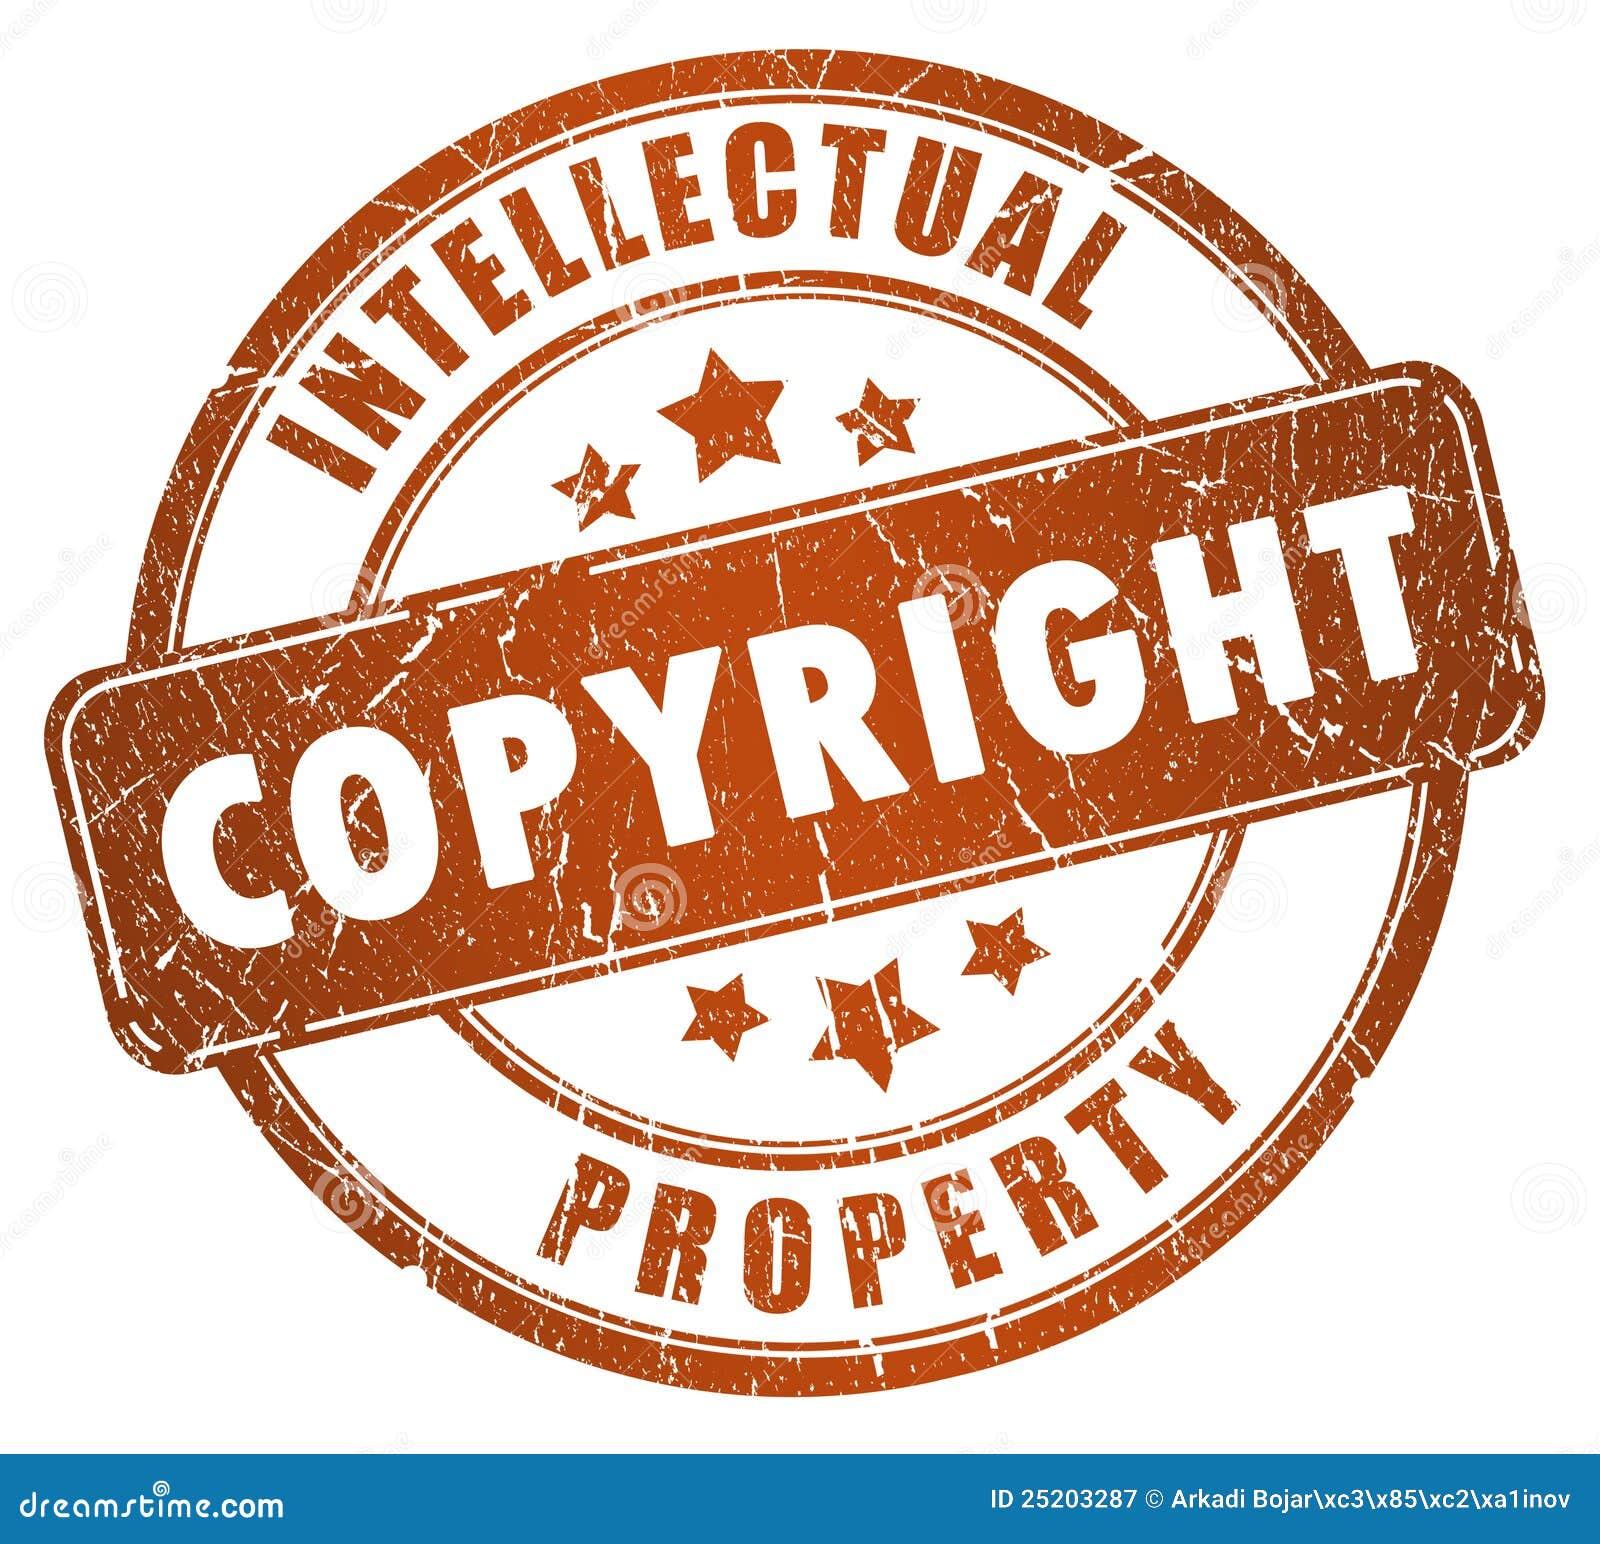 copyright stamp stock illustration illustration of illustration Copyright Royalty Tribunal copyright stamp